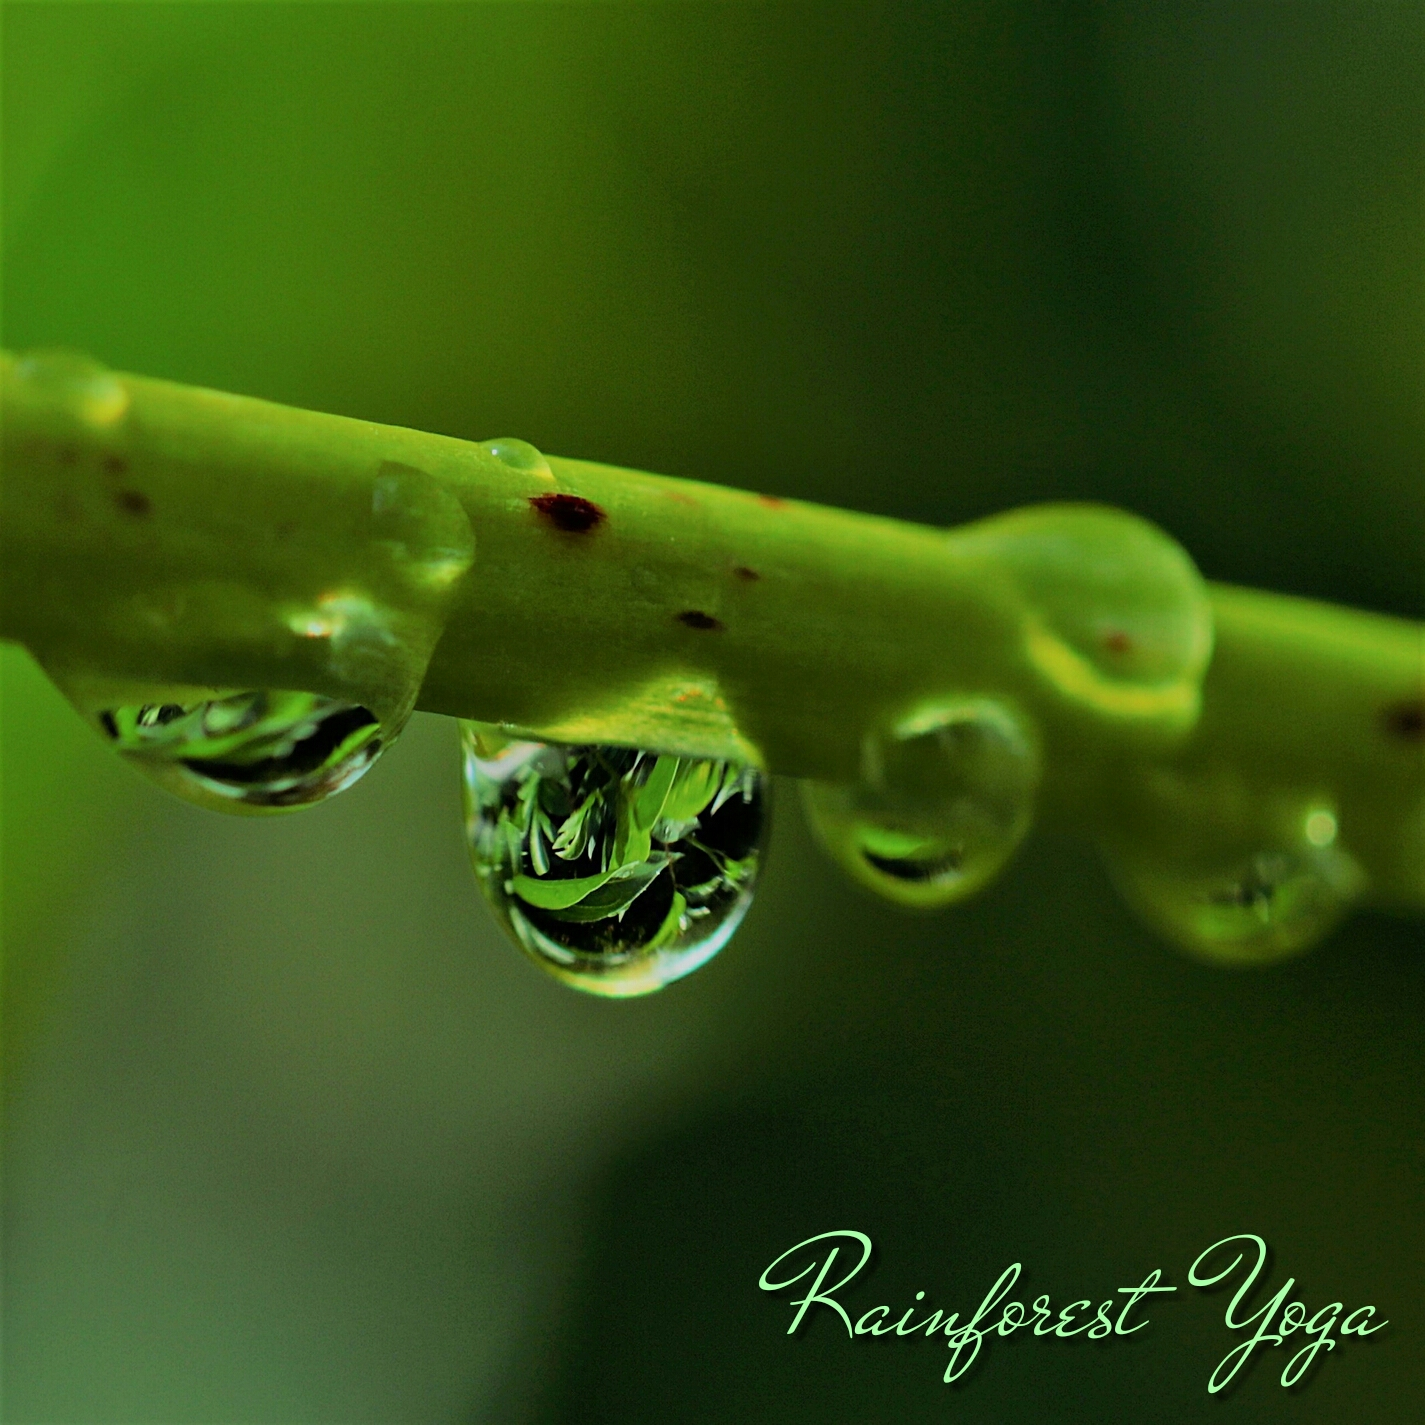 Rainforest Yoga Retreat Mp3 Music Download | Music2relax com